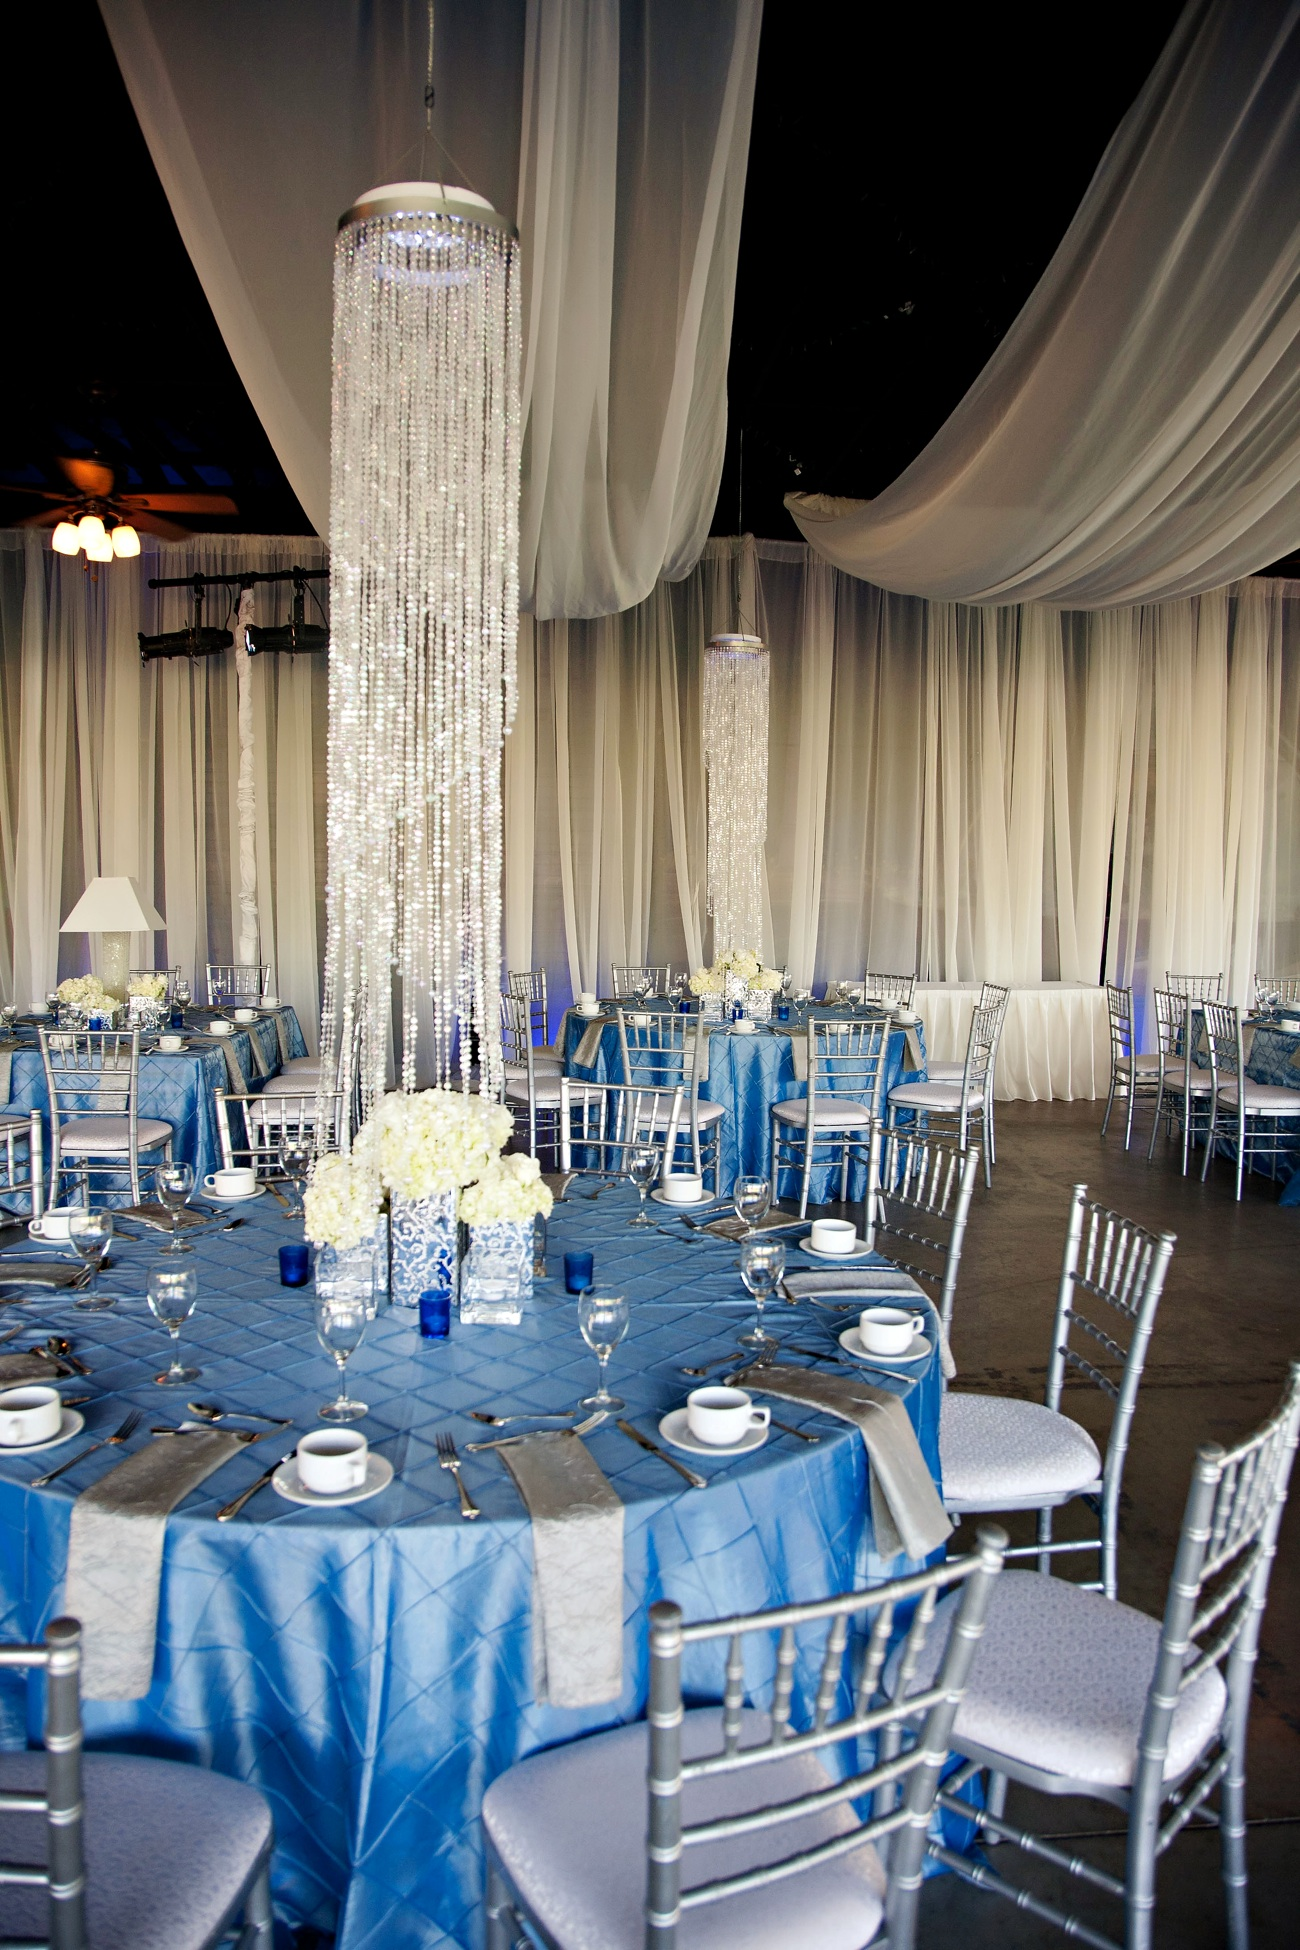 Inspirational wedding decorations blue and silver wedding blue and silver wedding themes gallery wedding decoration ideas junglespirit Choice Image